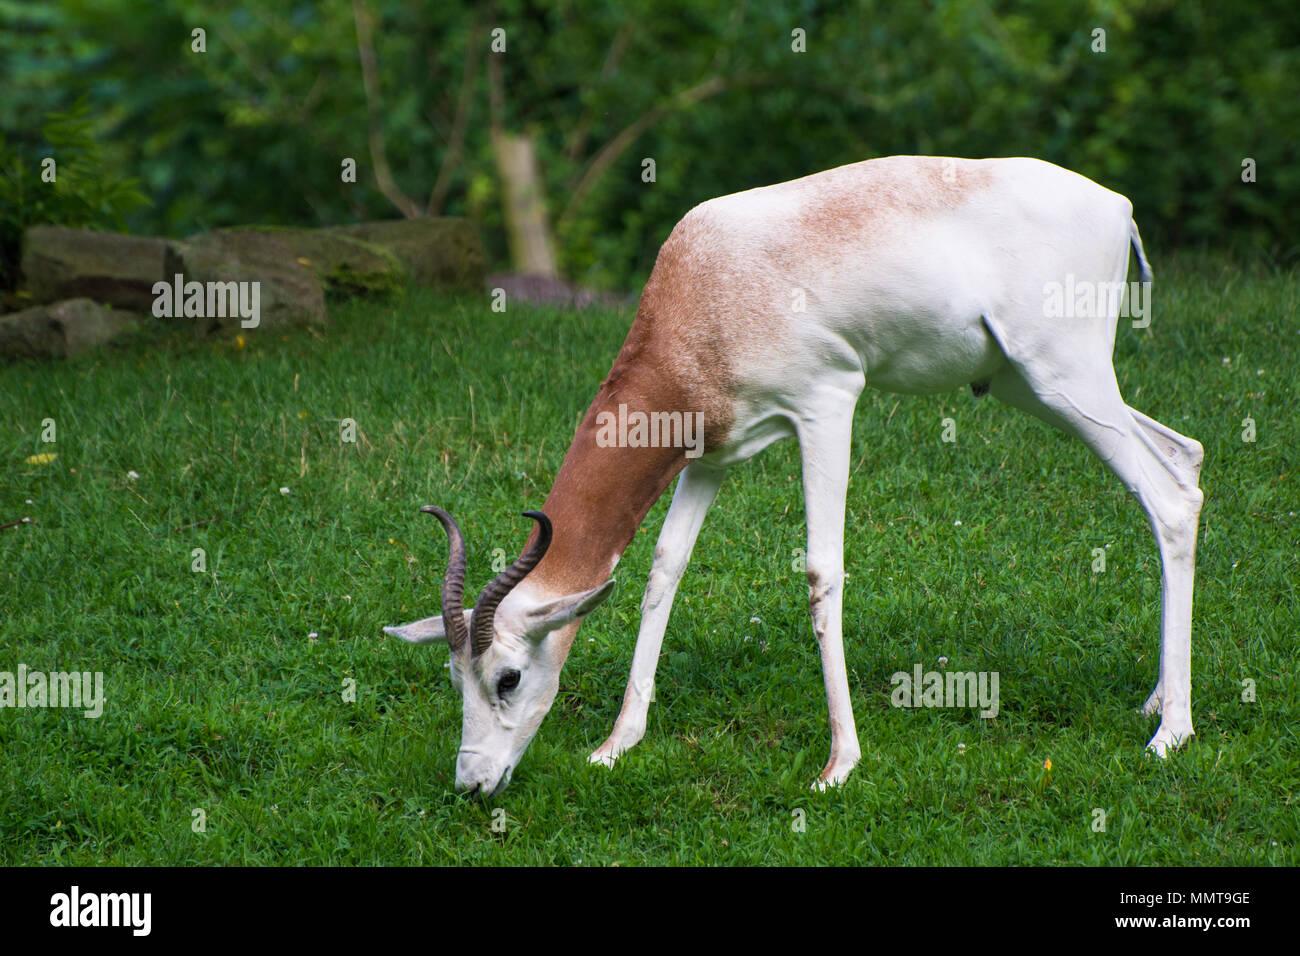 Springbok antelope, Pittsburgh Zoo, Pittsburgh, PA, USA - Stock Image